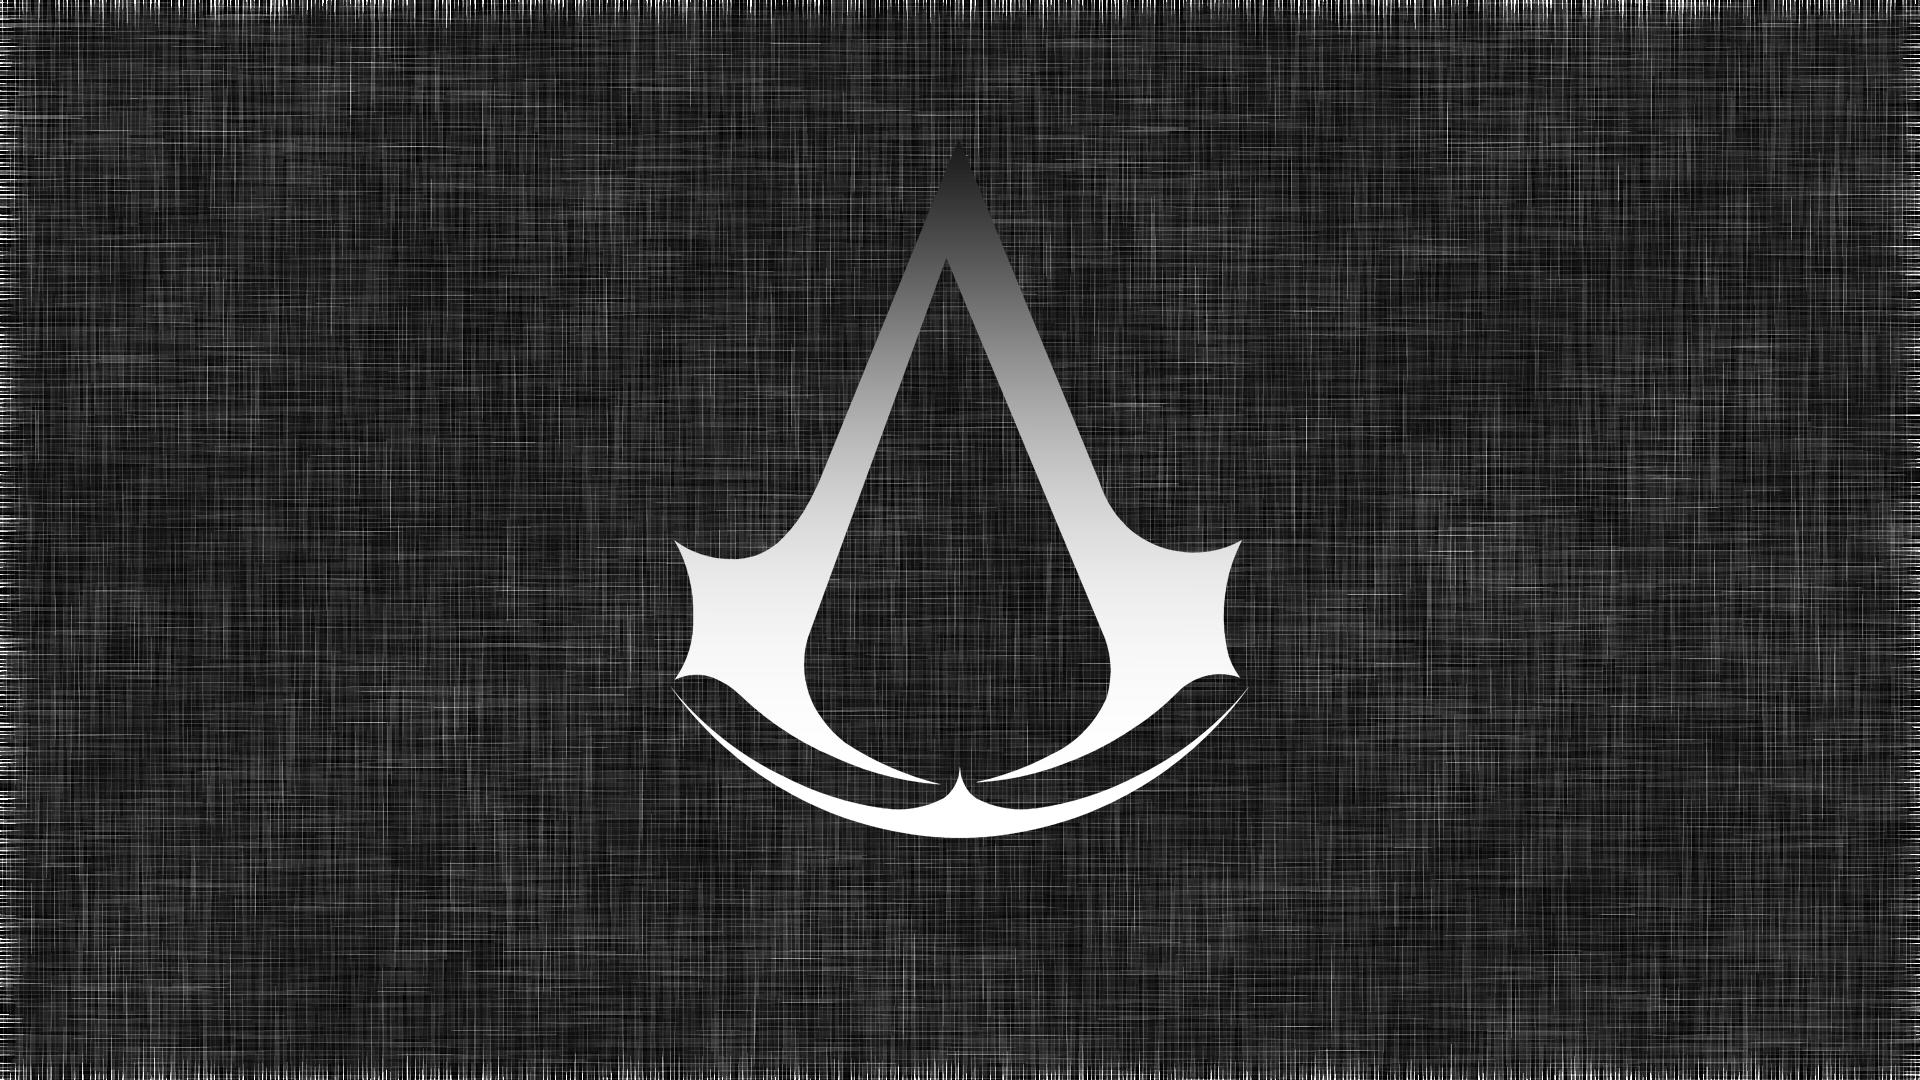 assassins creed logo wallpaperAssassins Creed Symbol wallpaper 169181 1920x1080